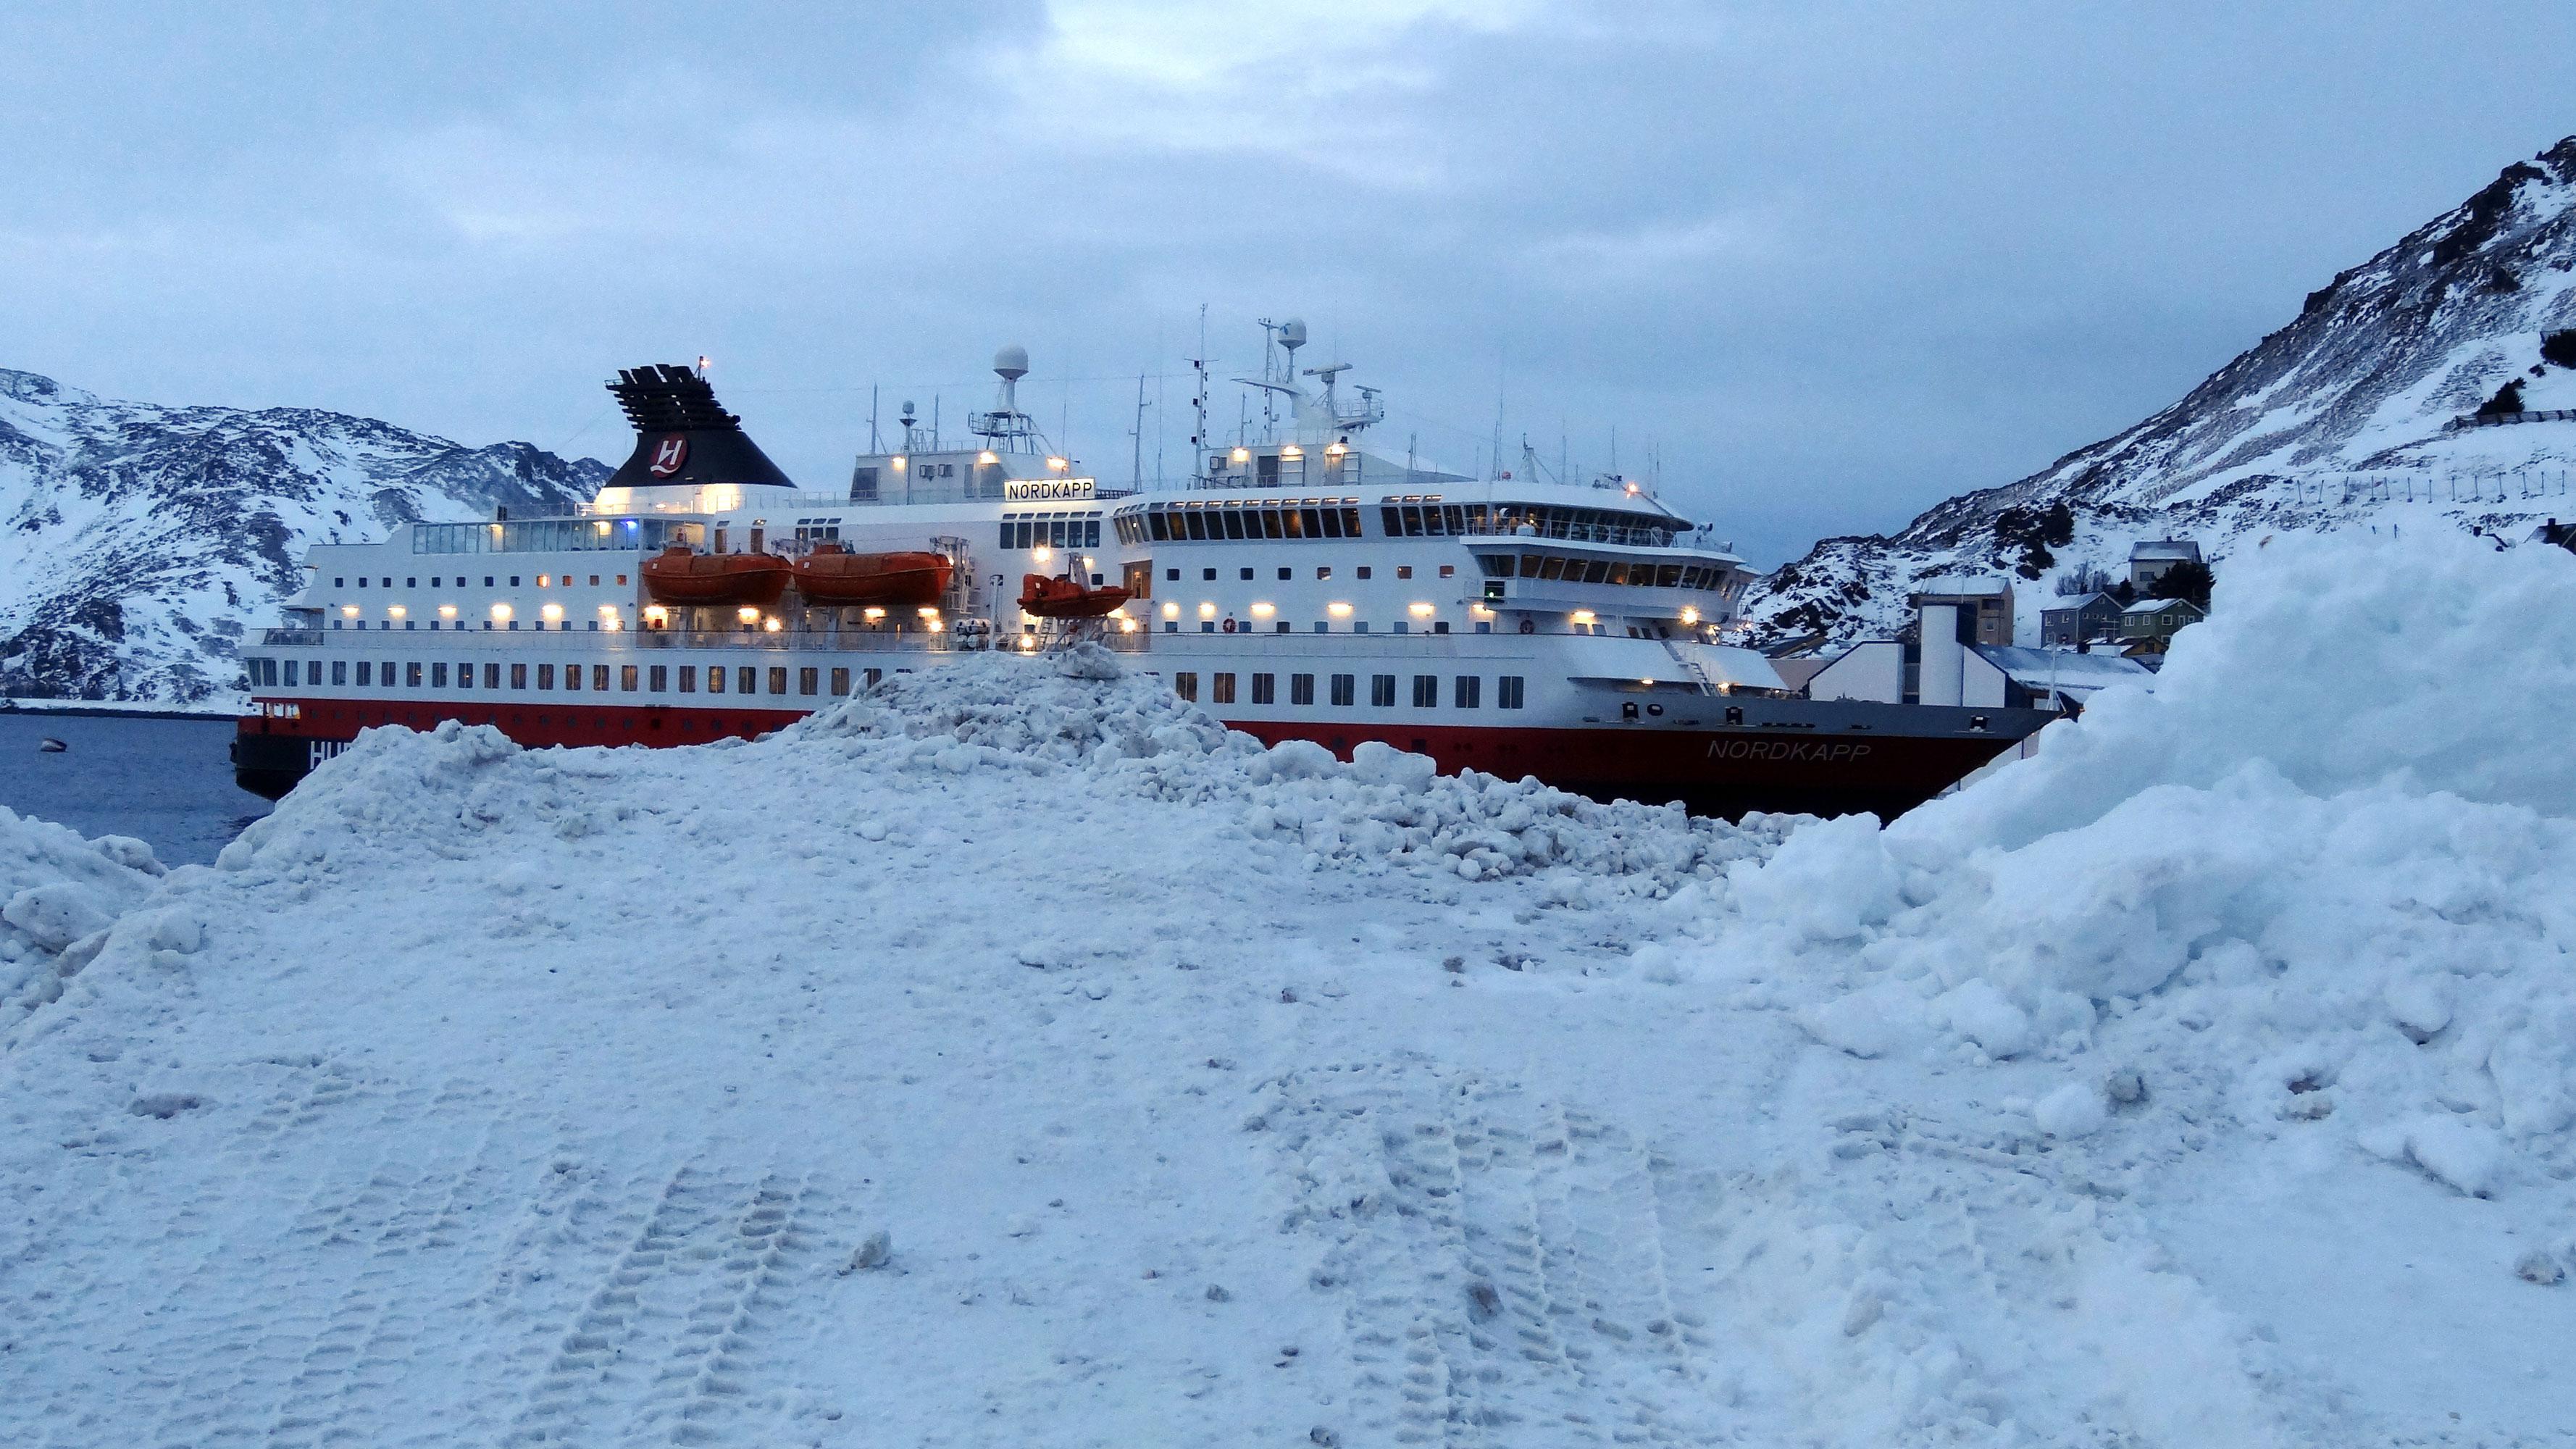 MS Nordkapp in Honningsvåg